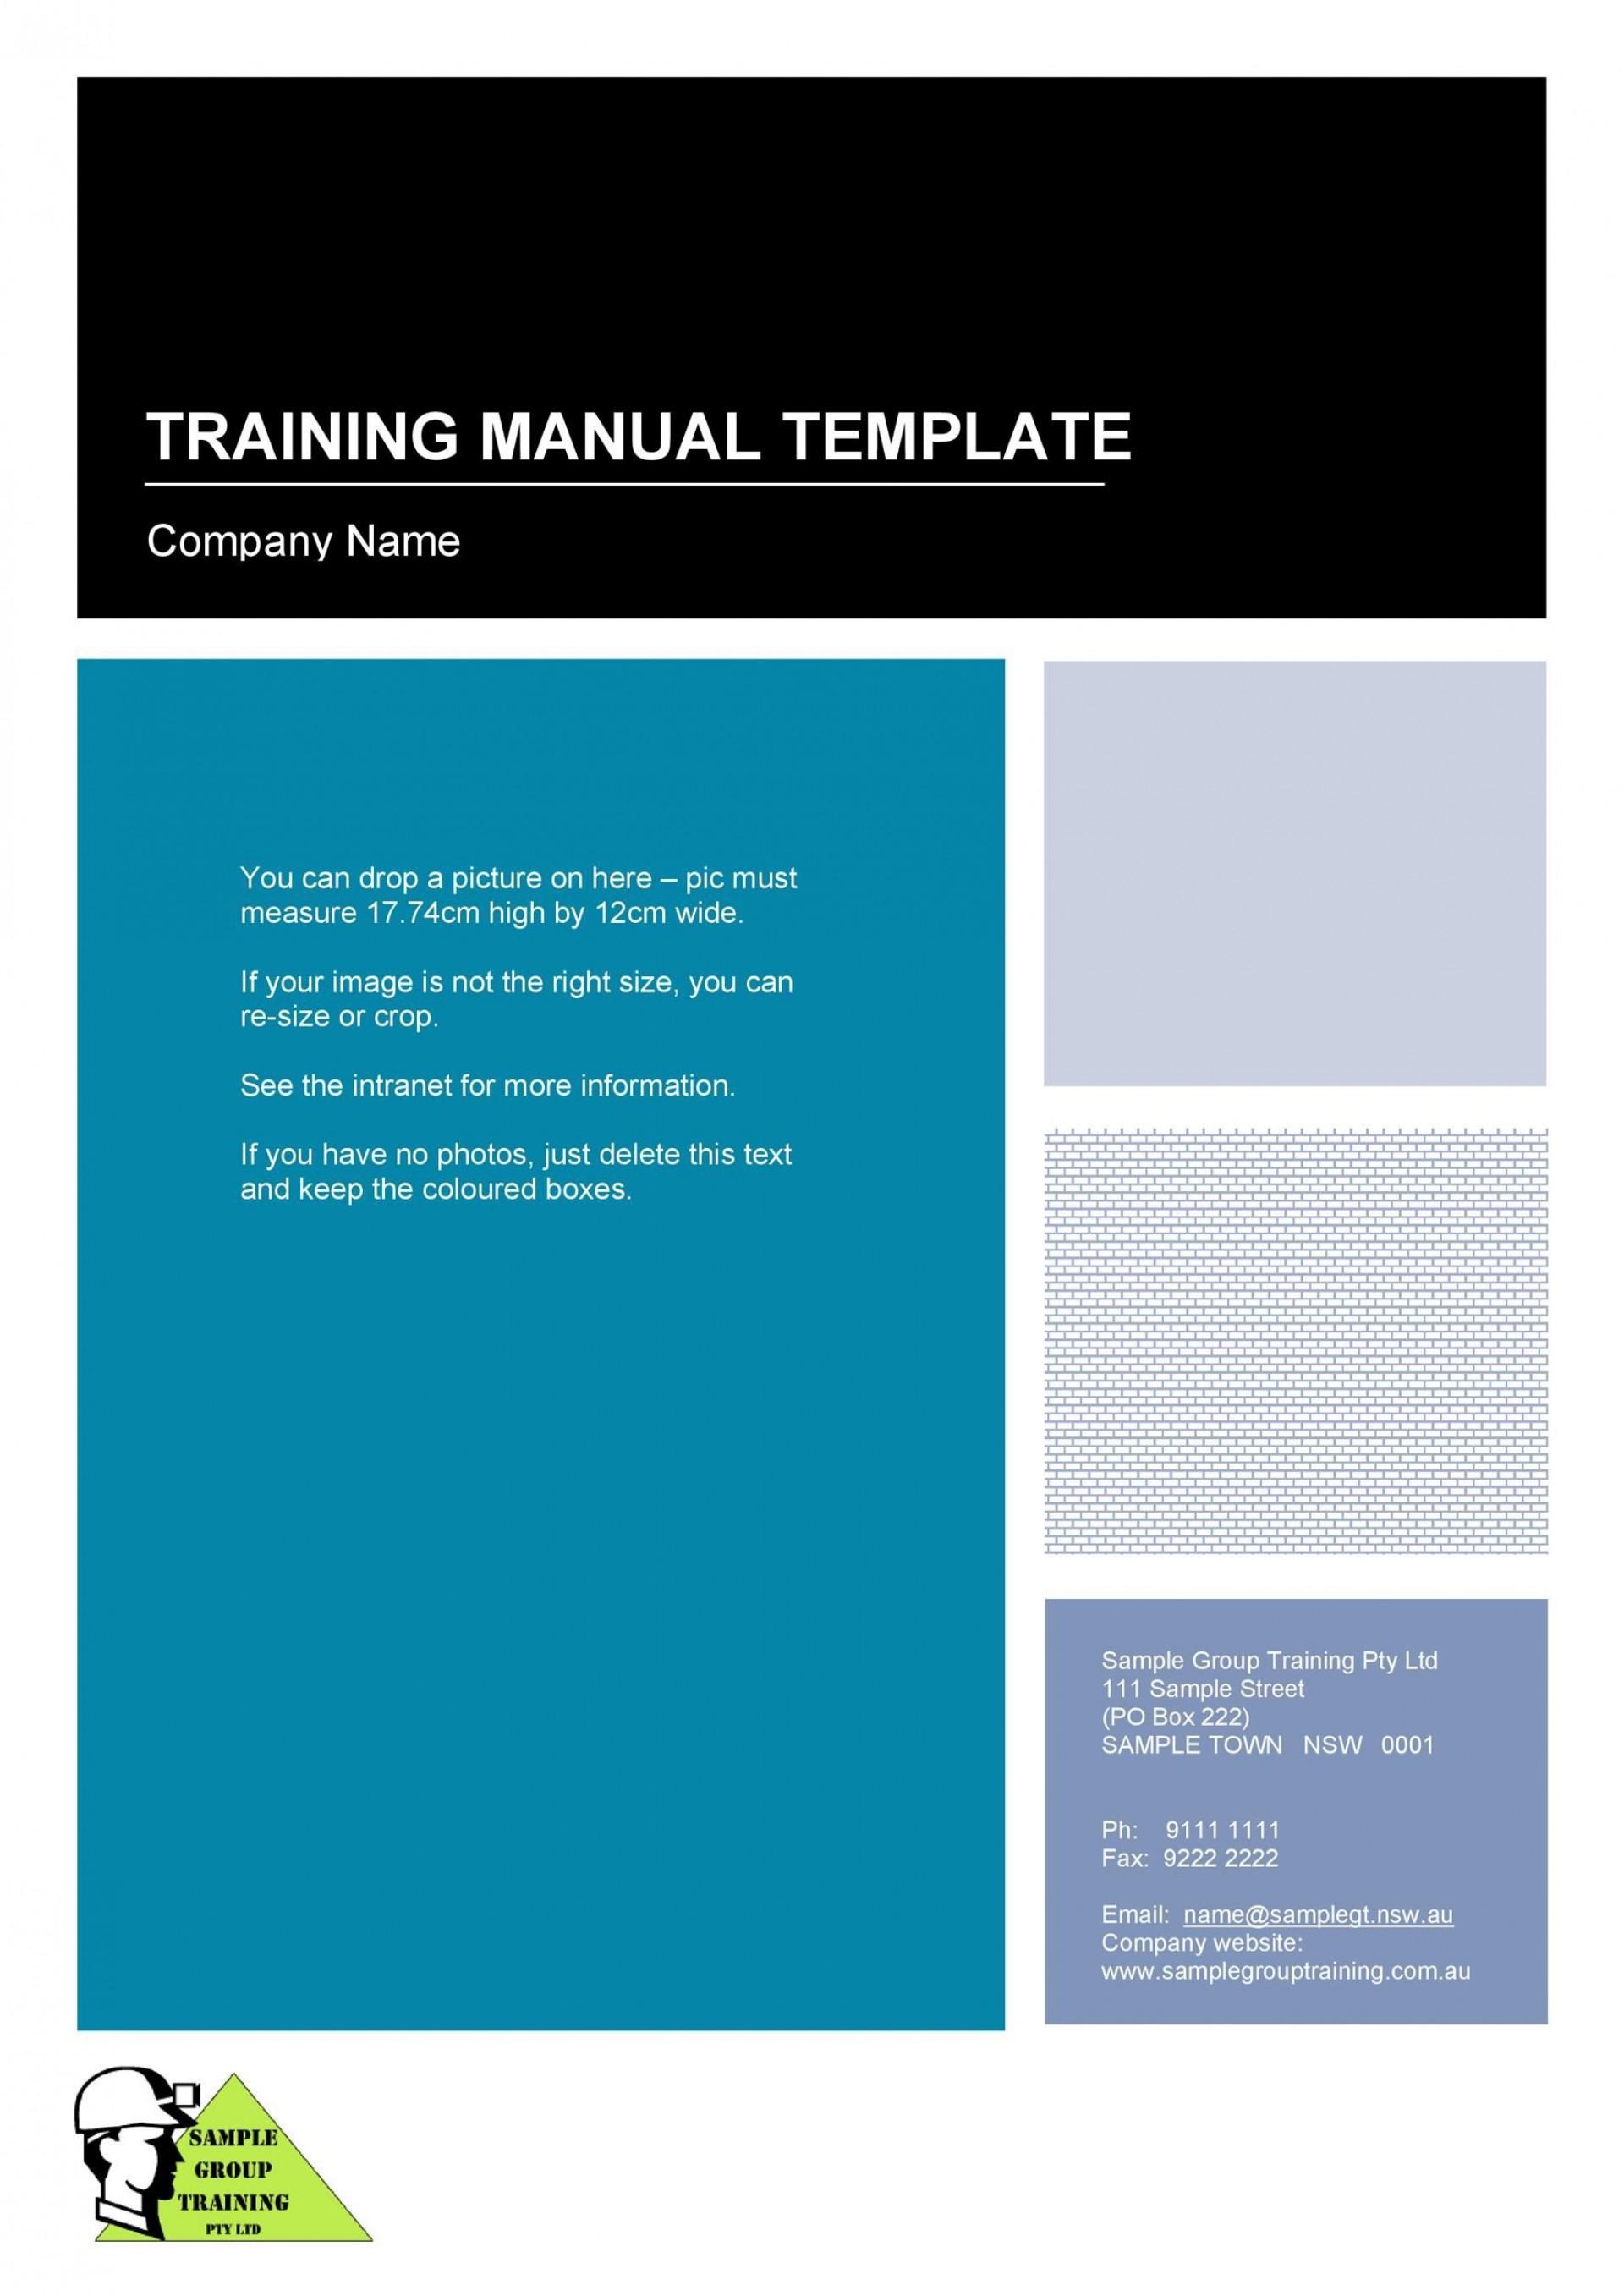 000 Phenomenal Employee Training Manual Template Inspiration  New Hire Example1920